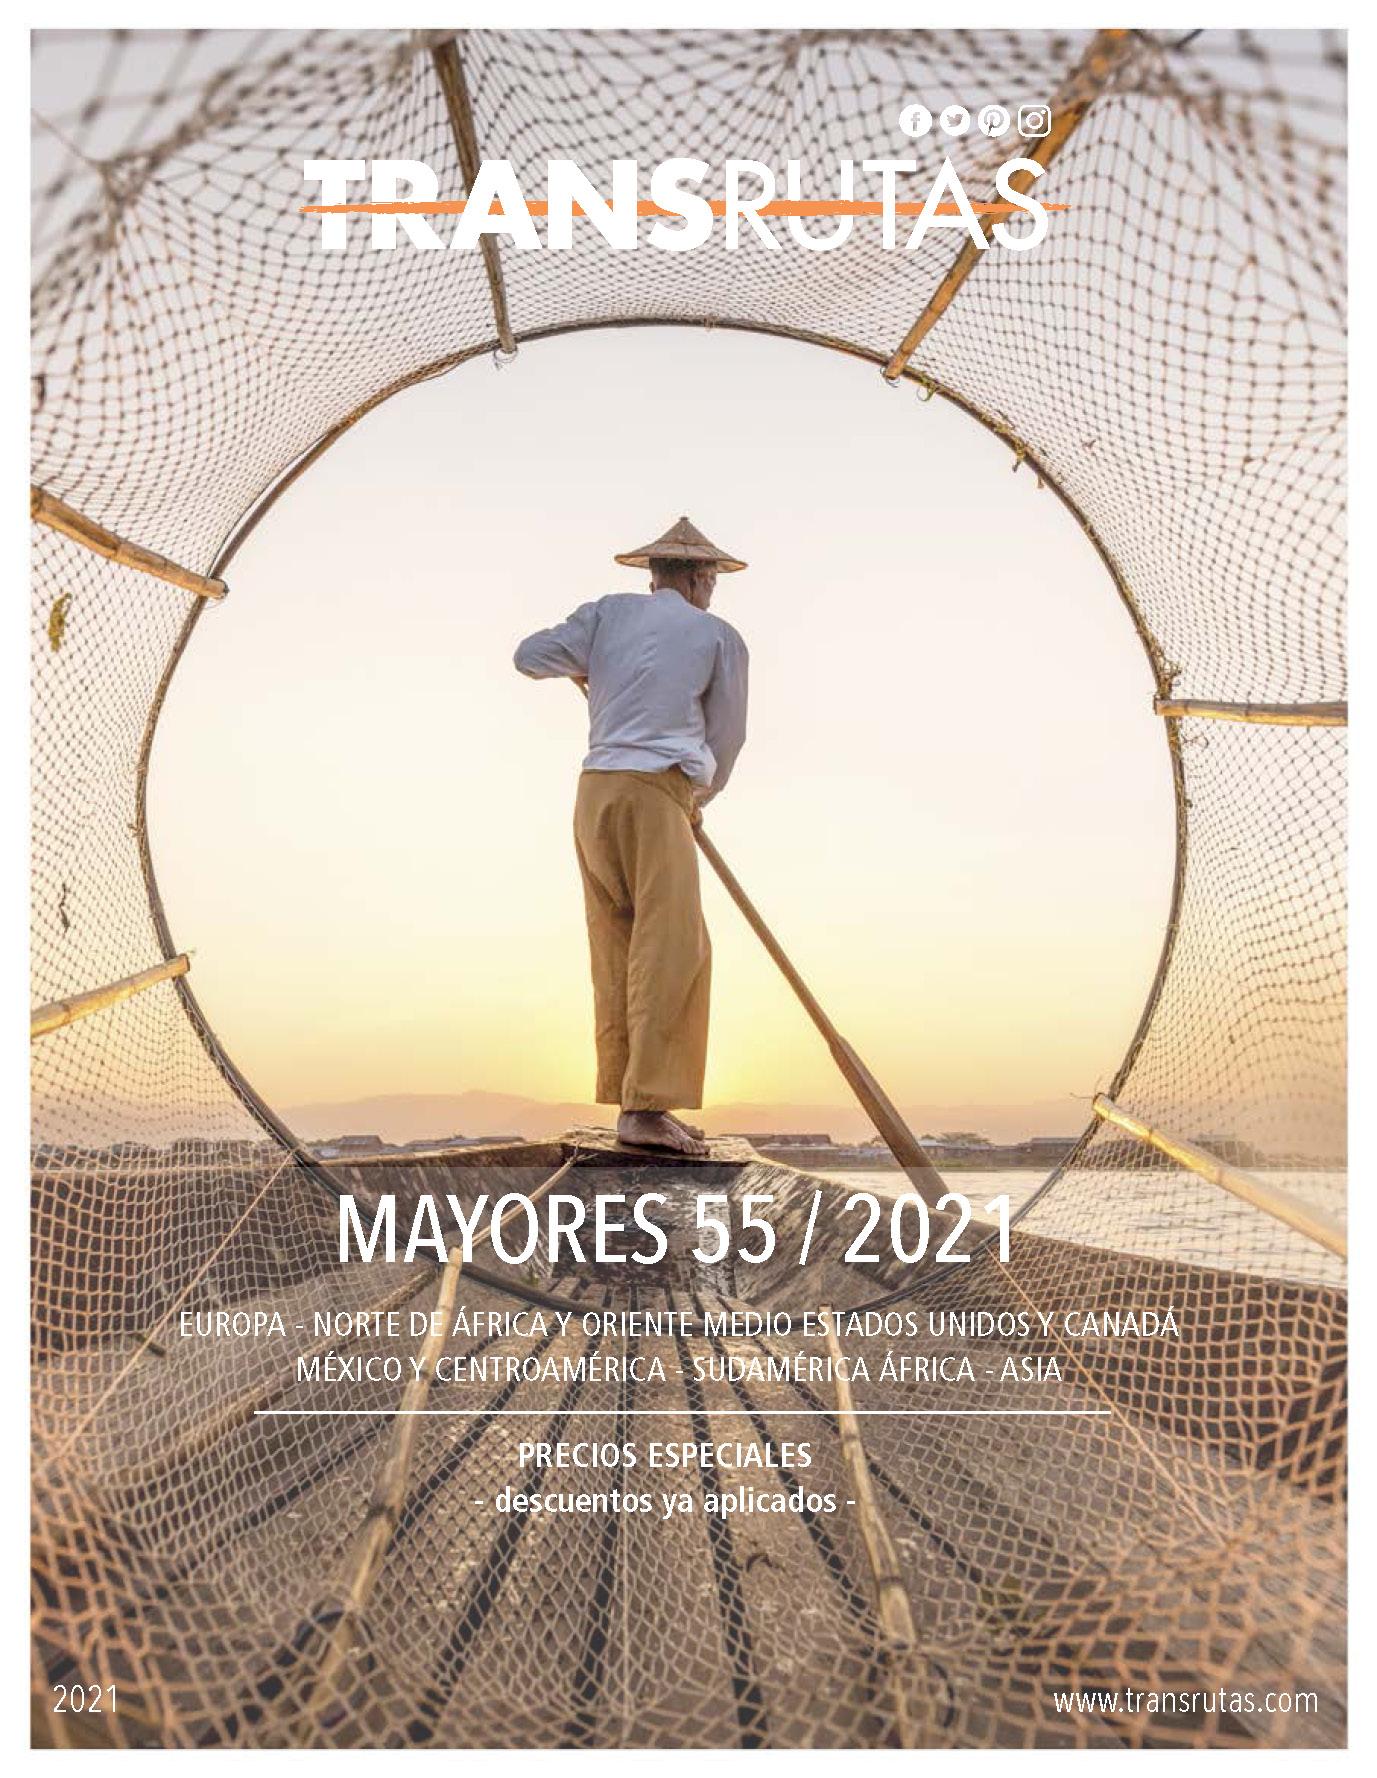 Catalogo Transrutas Mayores de 55 2020-2021